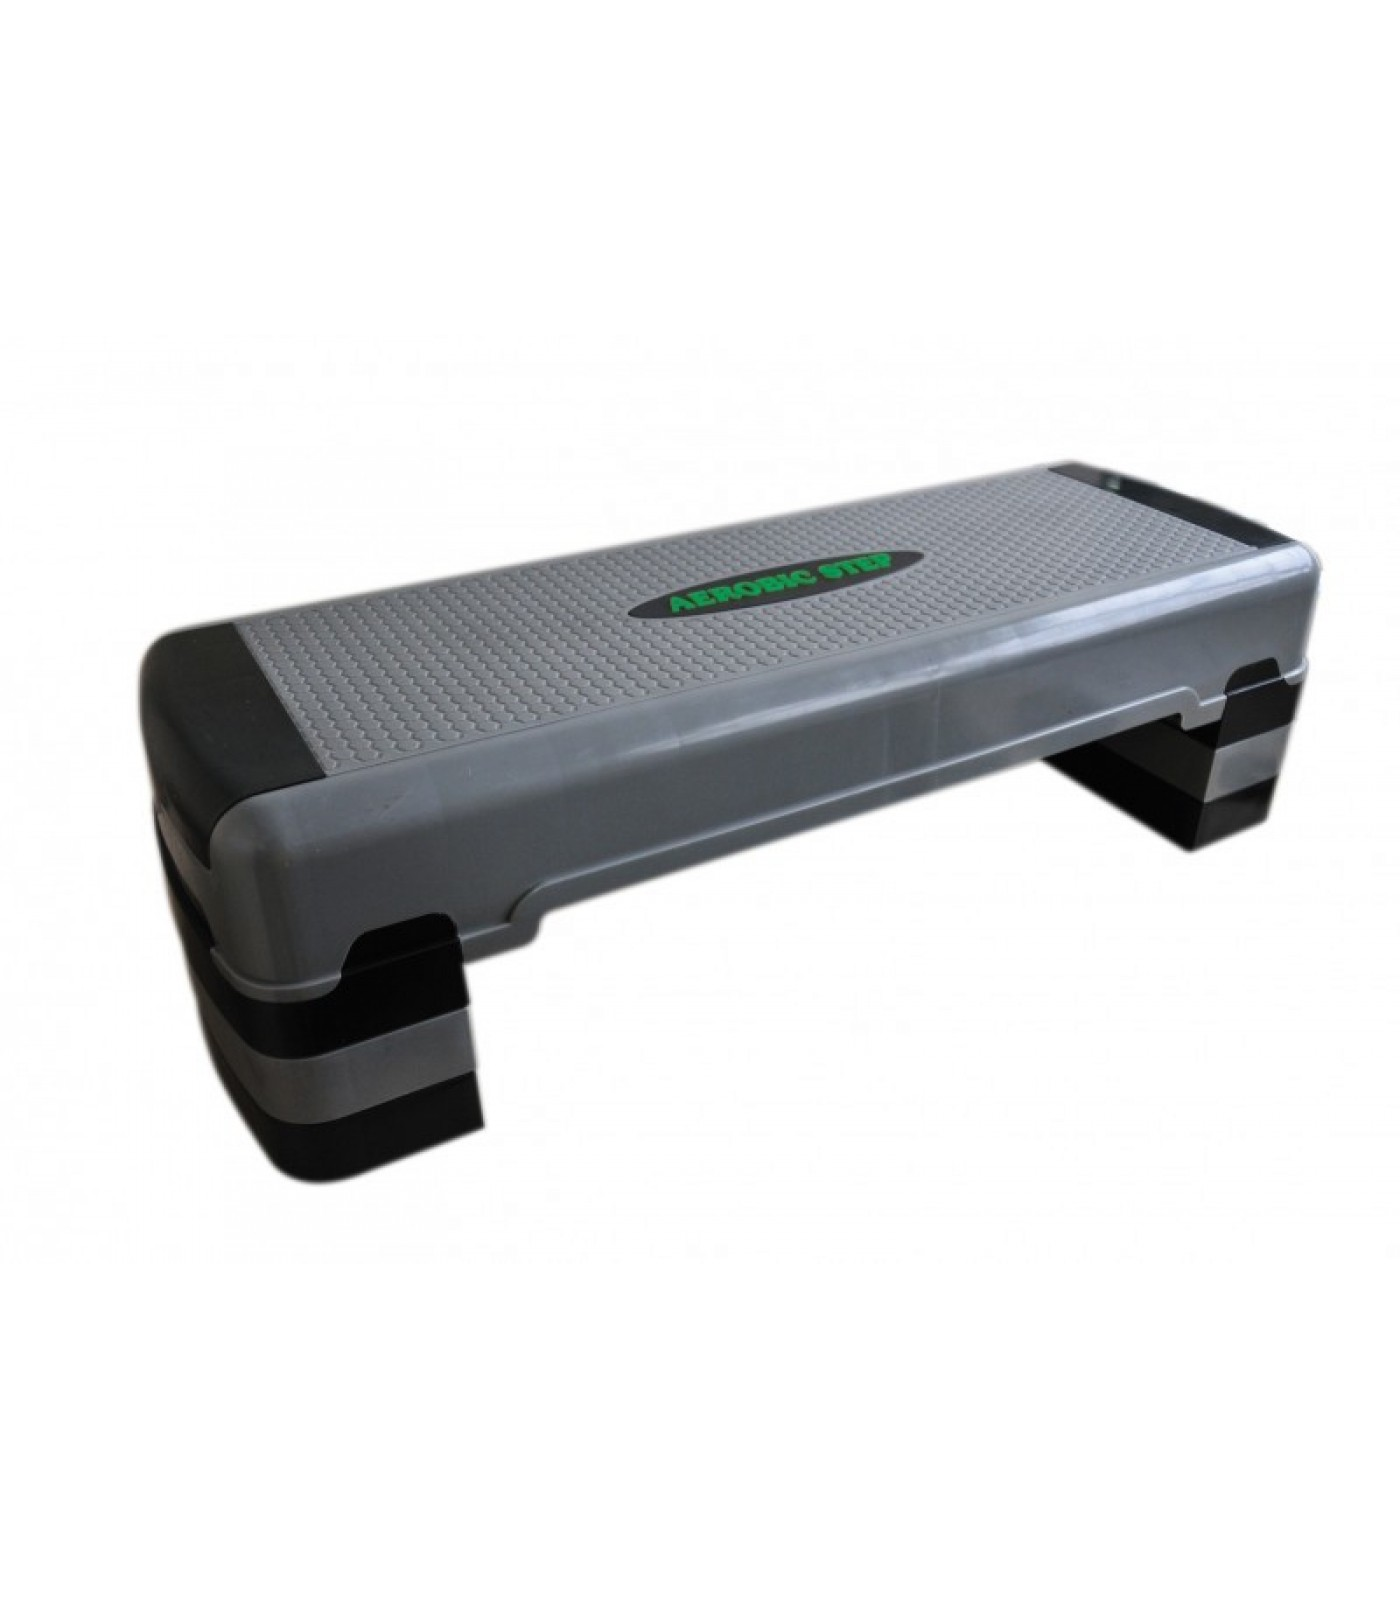 MSD - Степер за аеробика